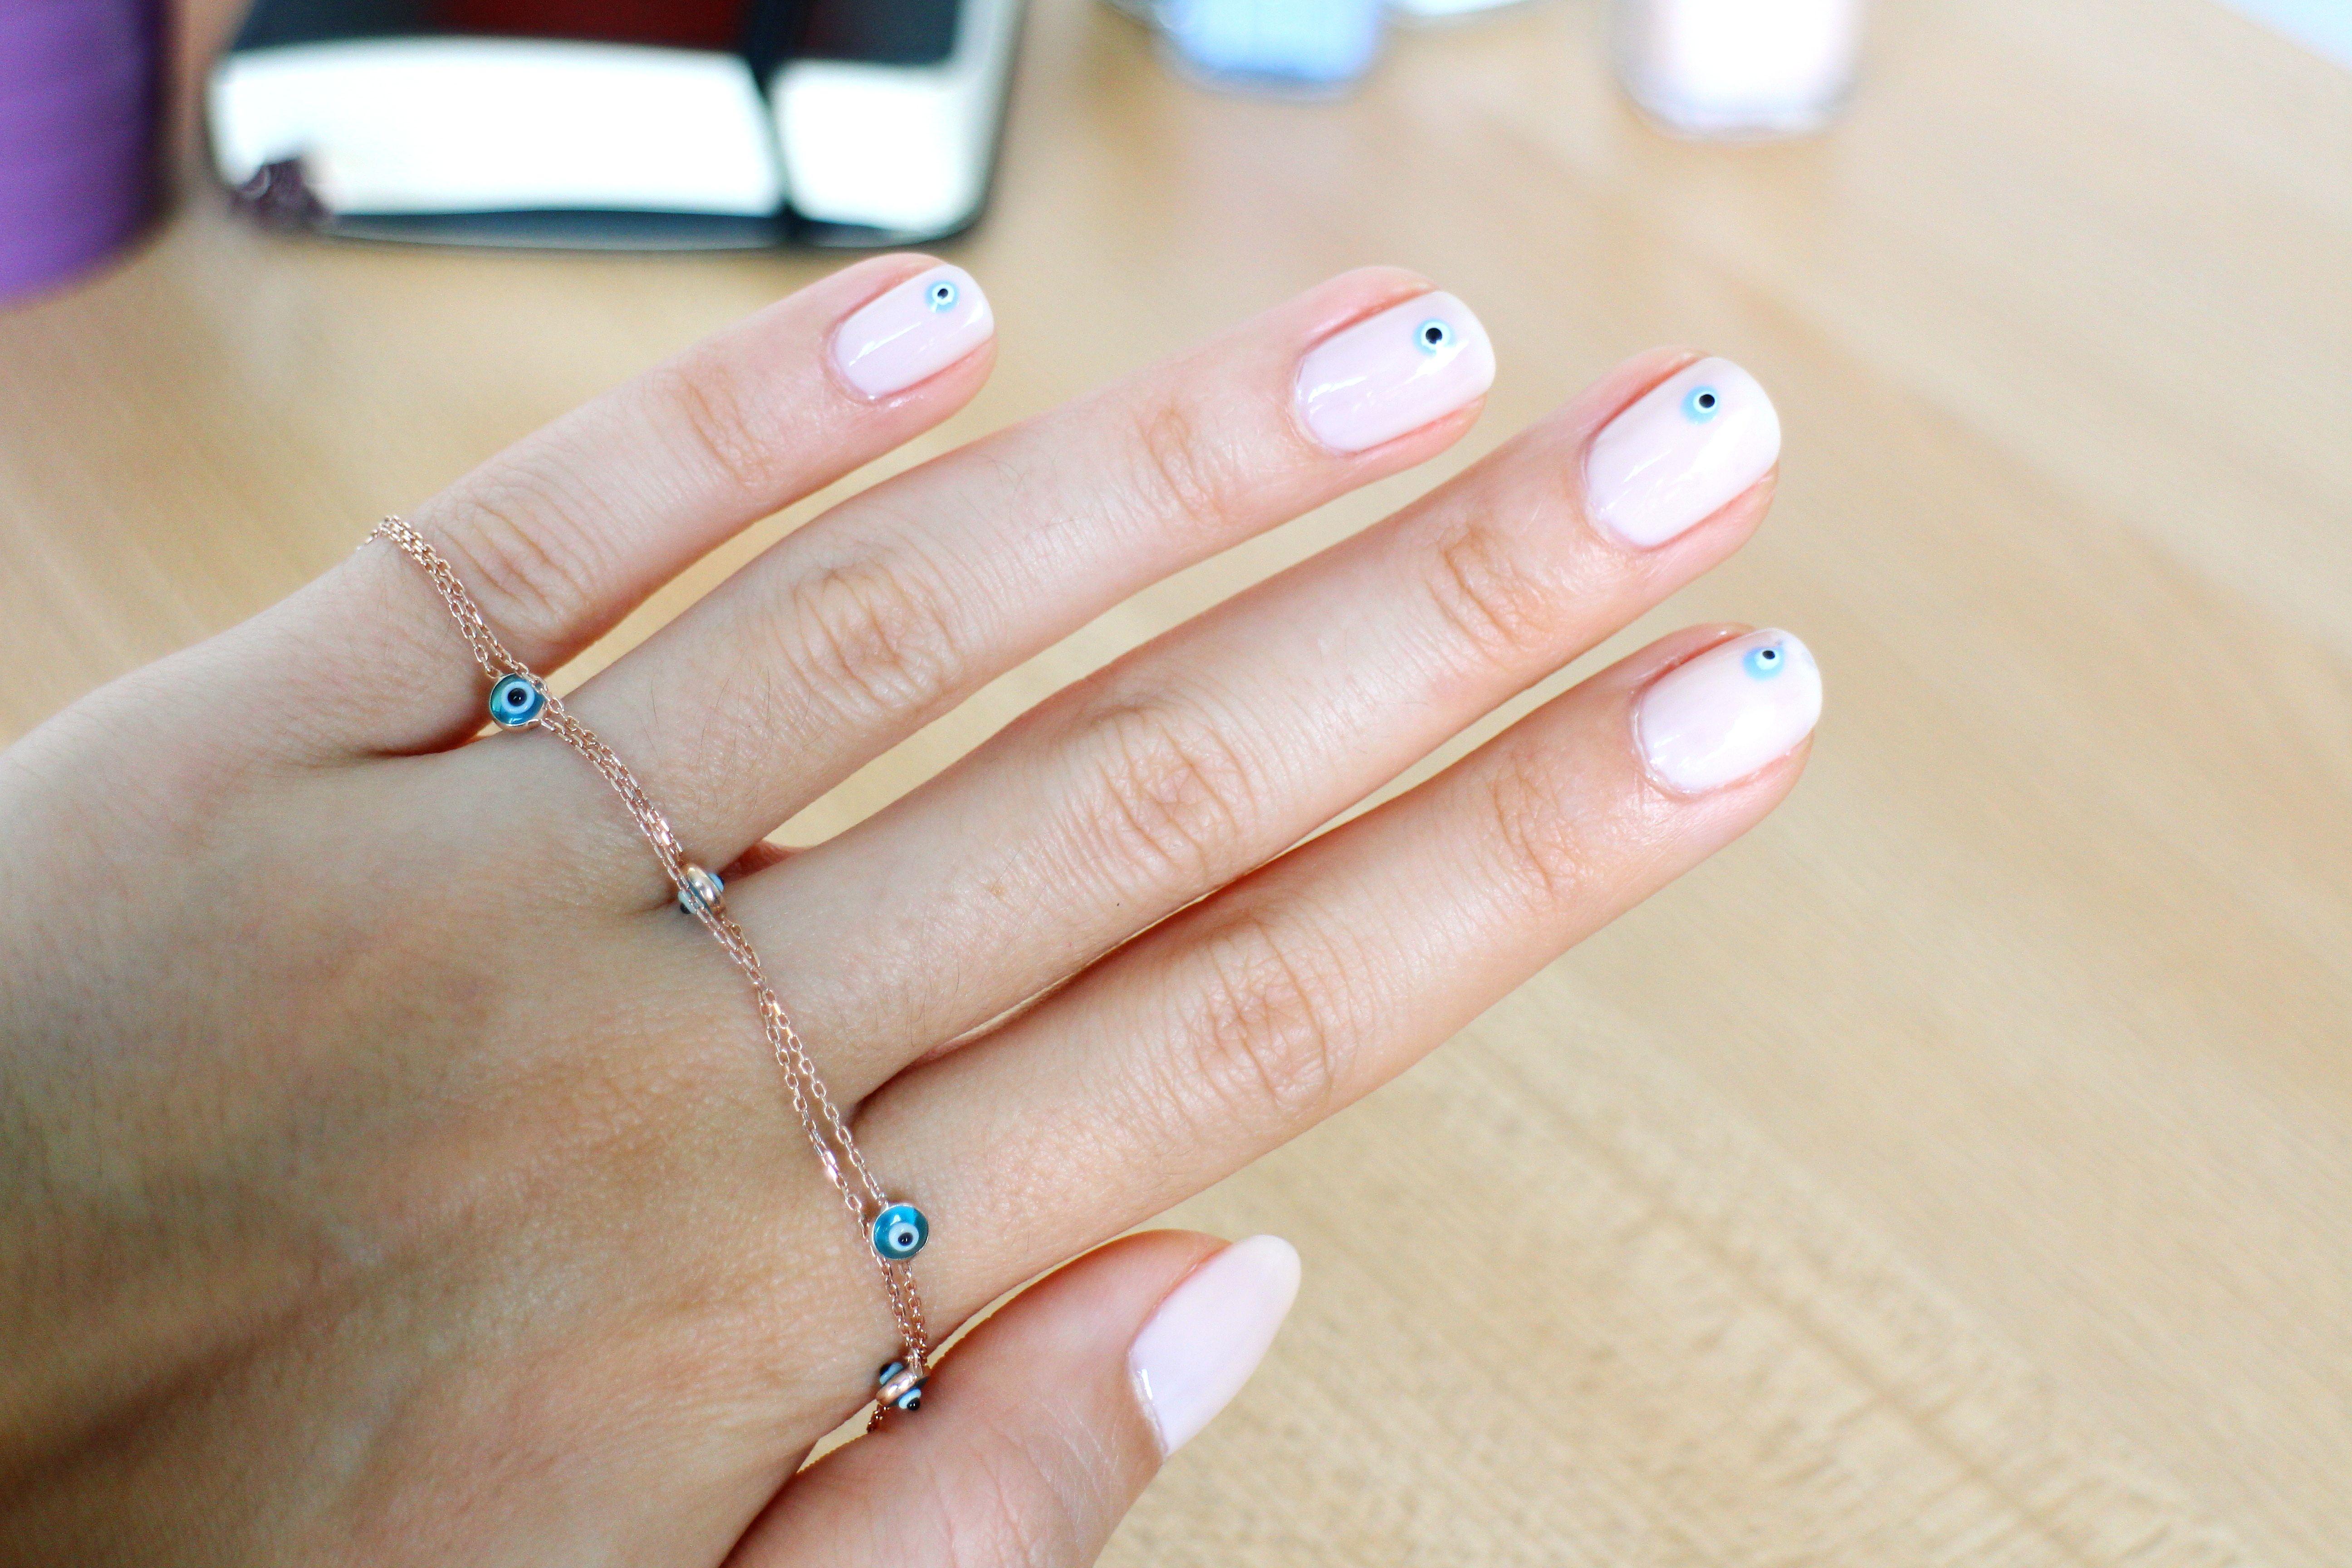 Evil Eye Nails | Nail art | Pinterest | Evil eye nails, Evil eye and Eye